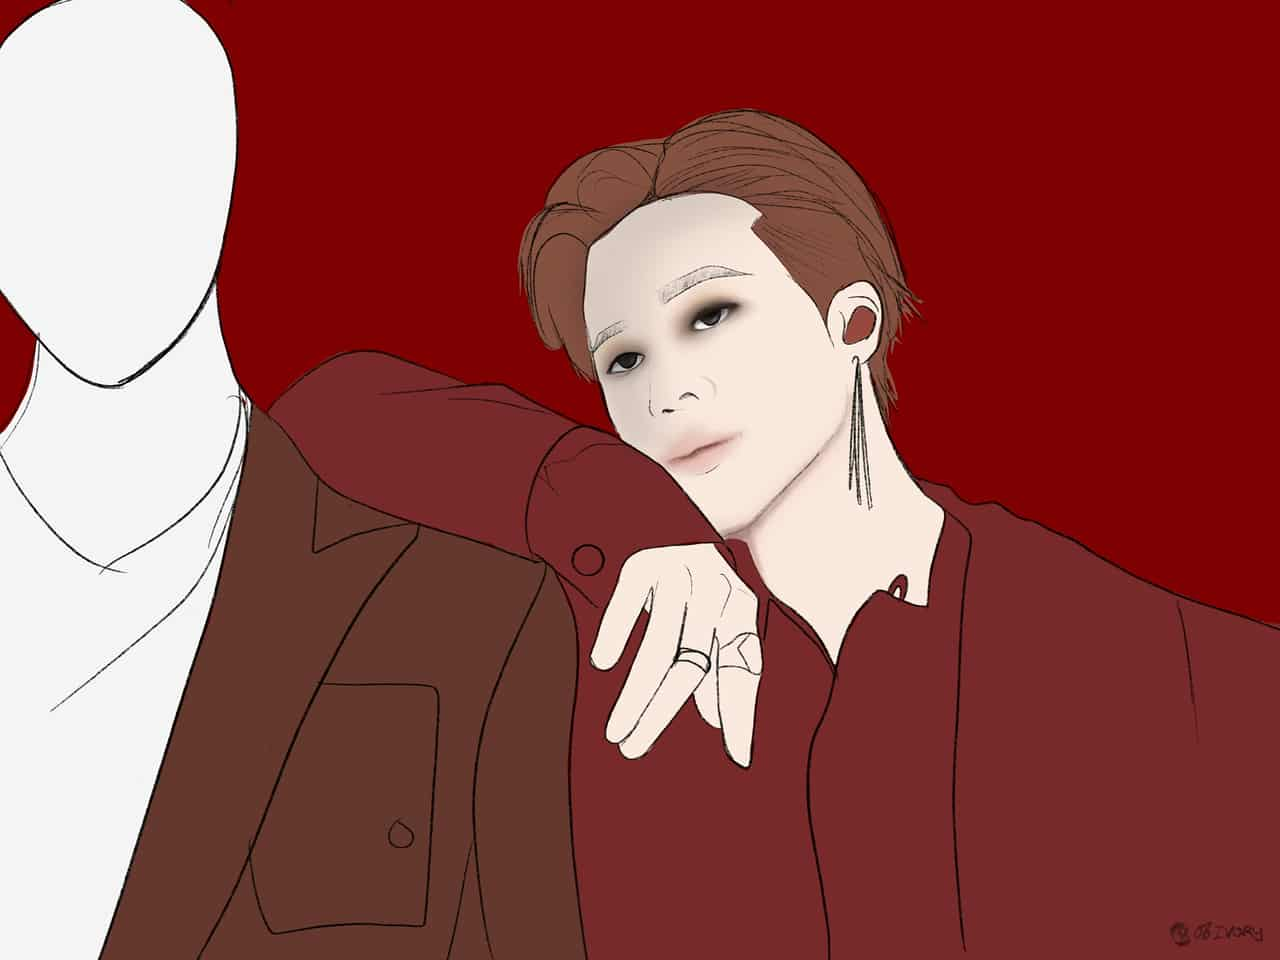 BTS ON:E Illust of Ivory Post_Multiple_Images_Contest piercing Jin Taehyung fanart Jimin SUGA Jk RM medibangpaint Jhope BTS